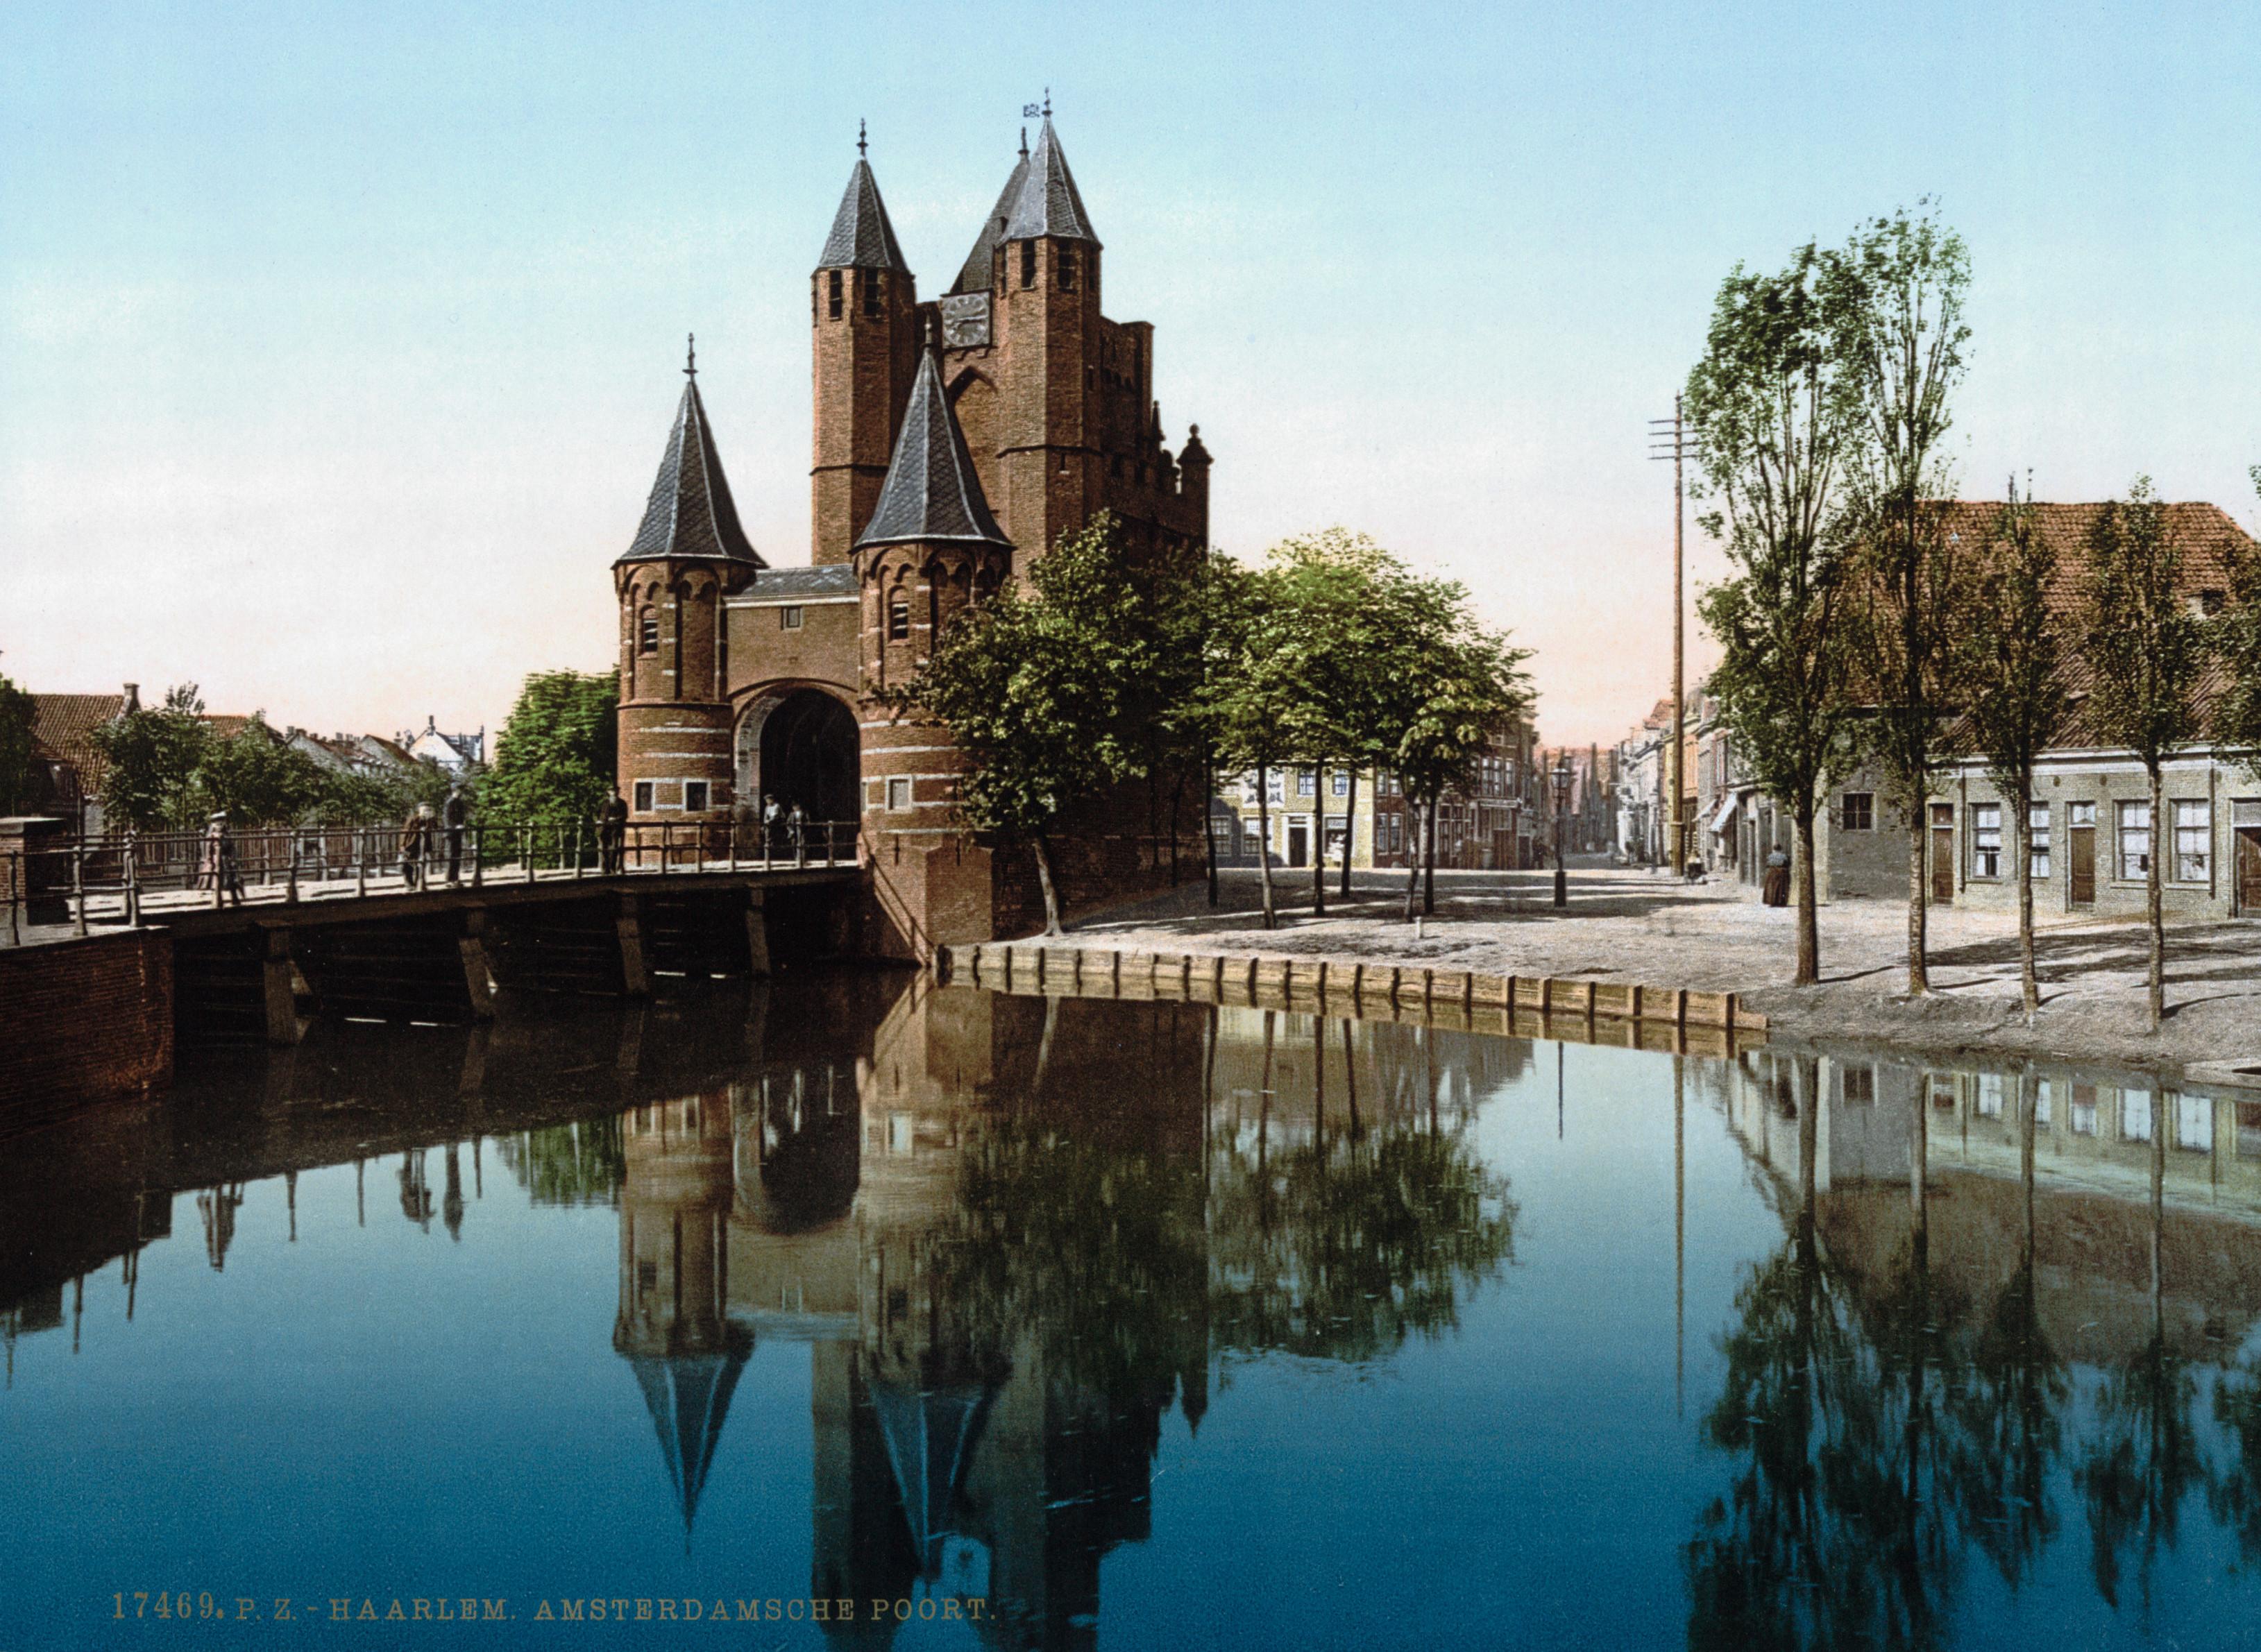 File:Haarlem - Amsterdamse Poort 1900.jpg - Wikimedia Commons